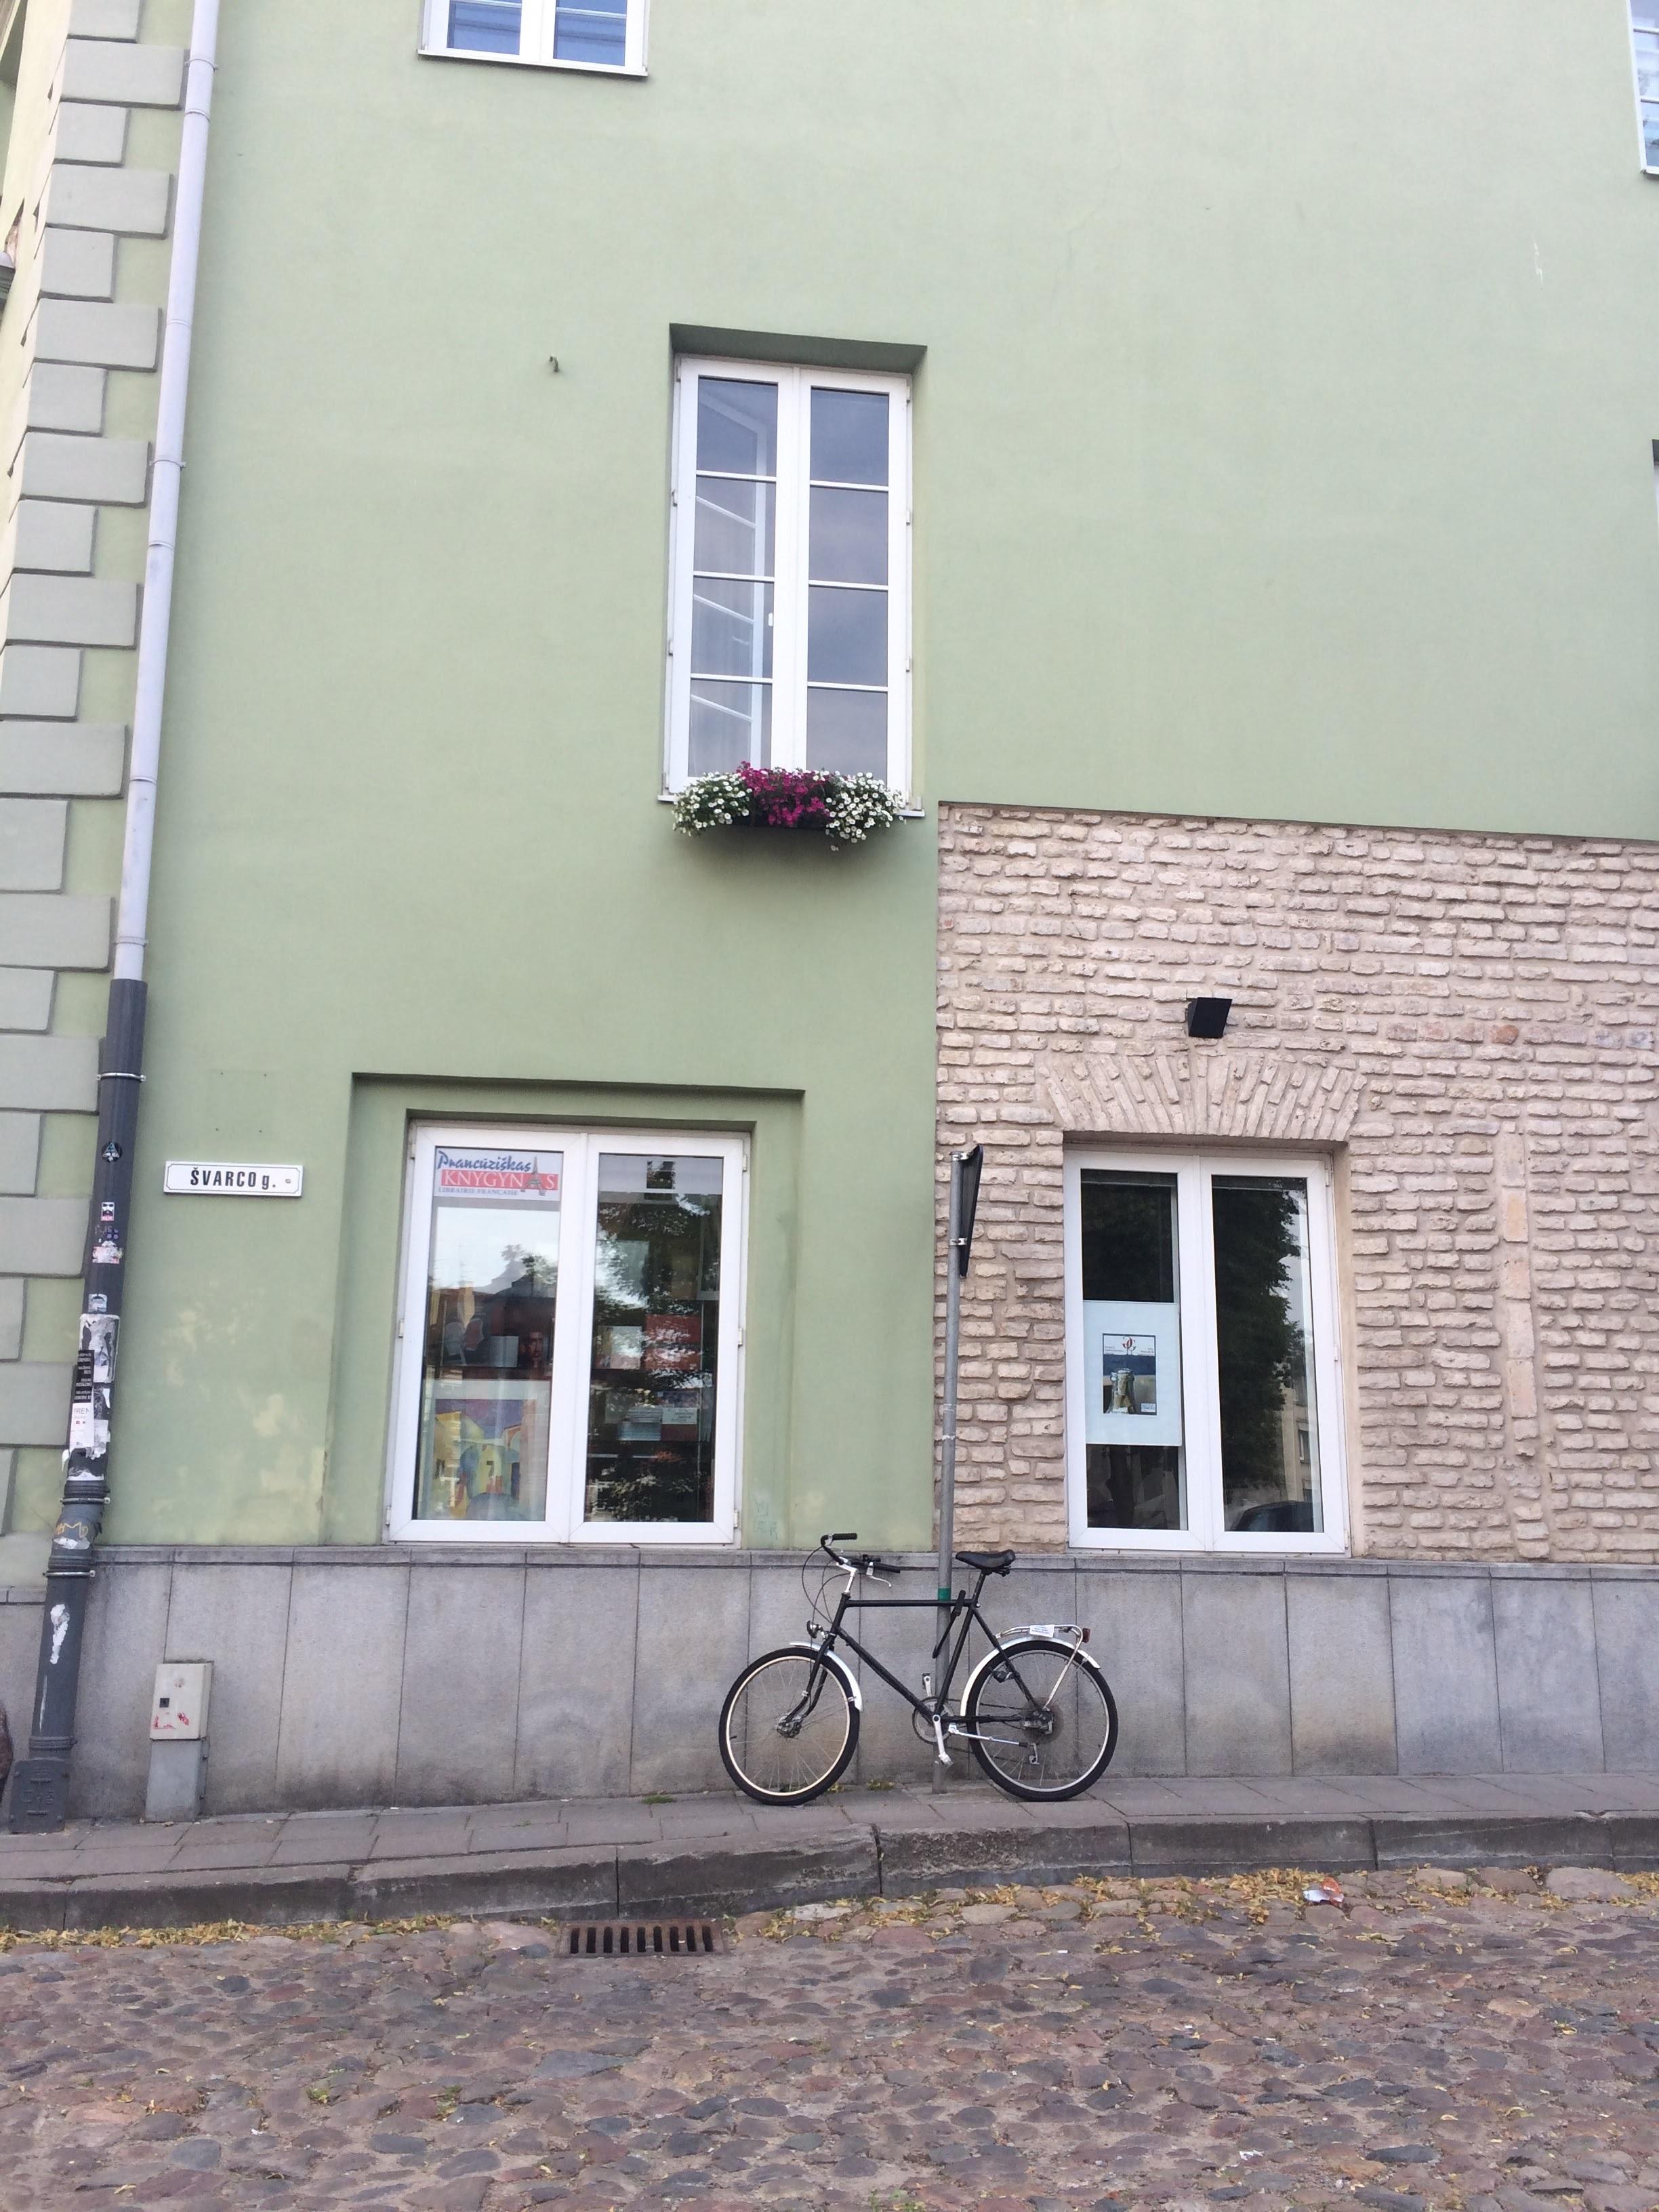 Streets of Old Vilnius